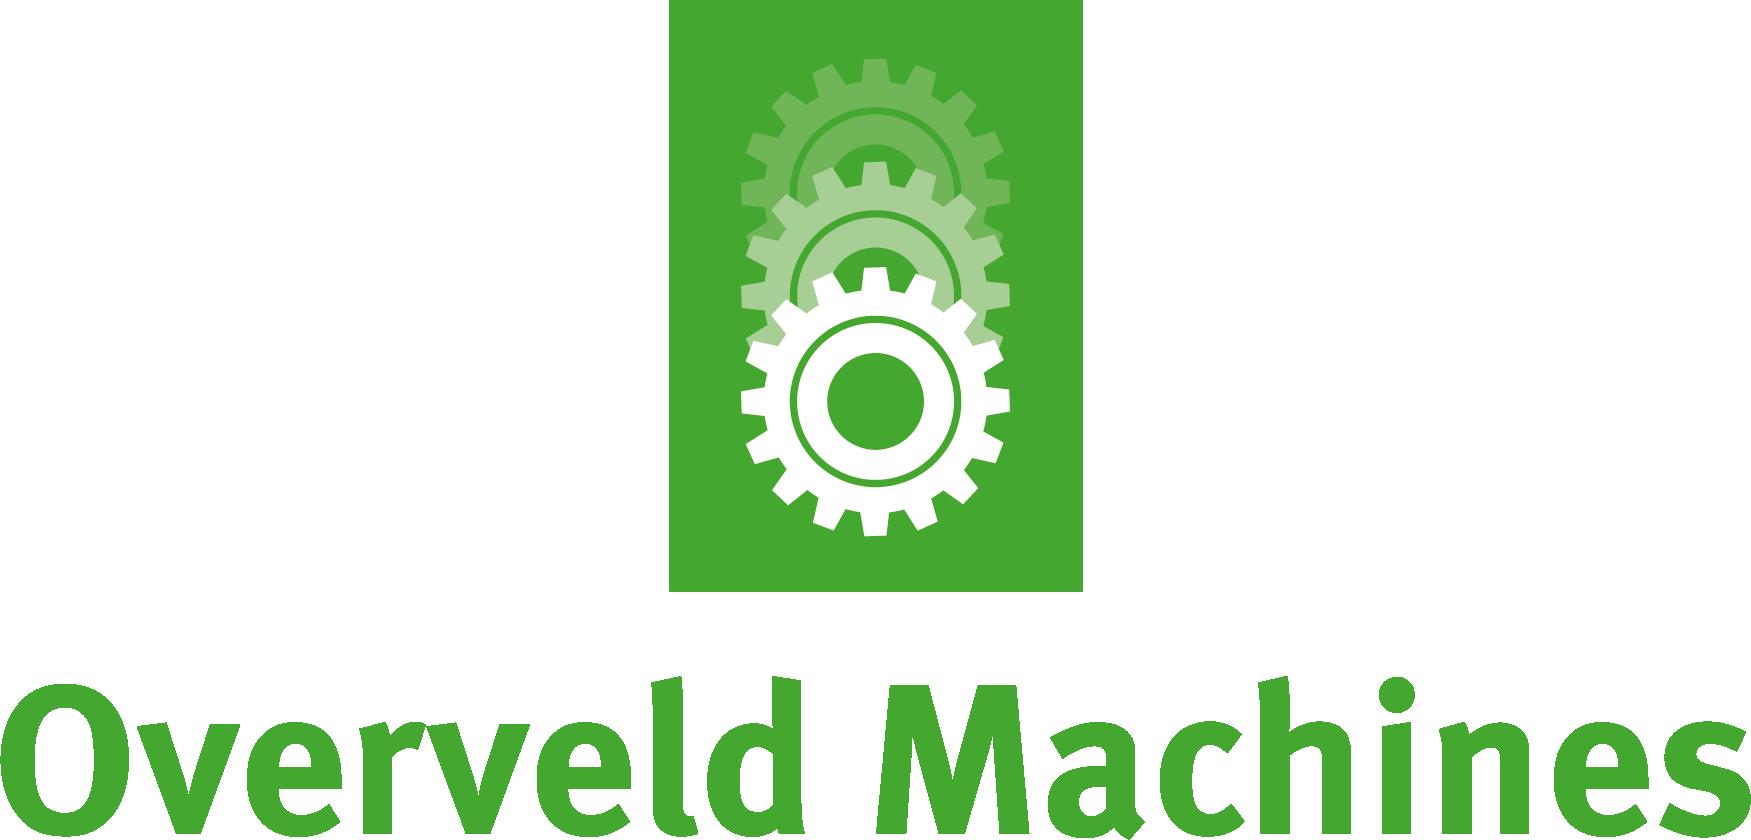 Overveld Machines